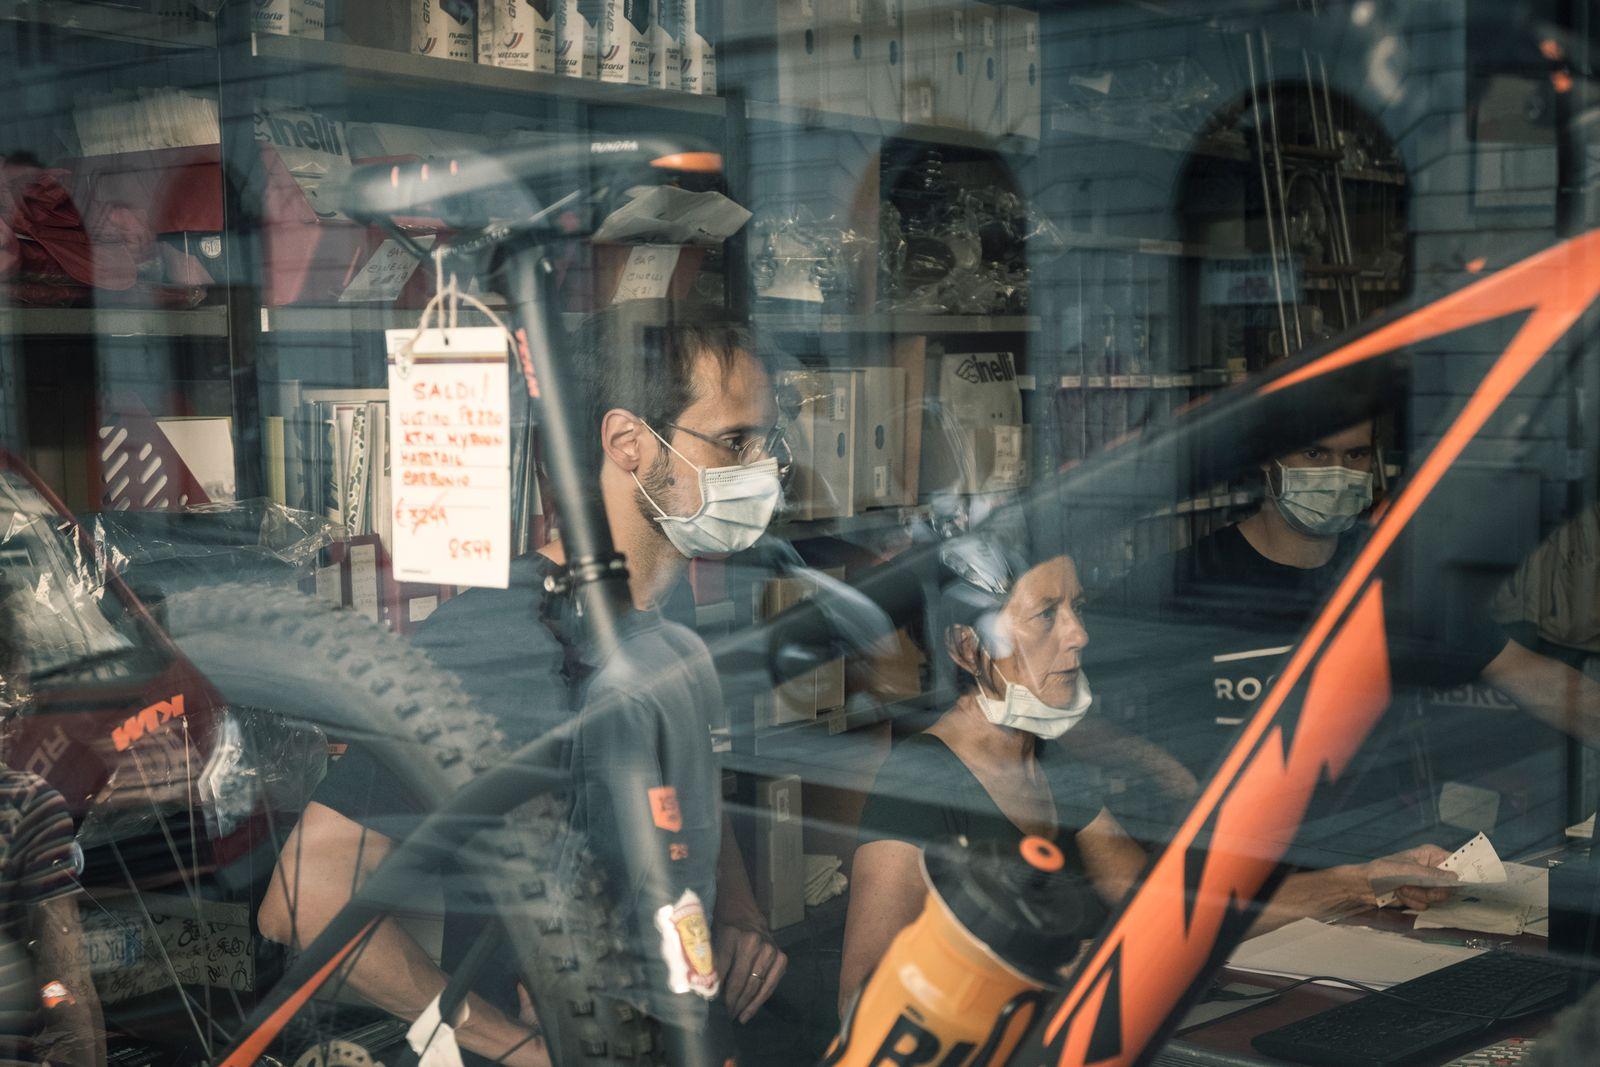 milano bike_20